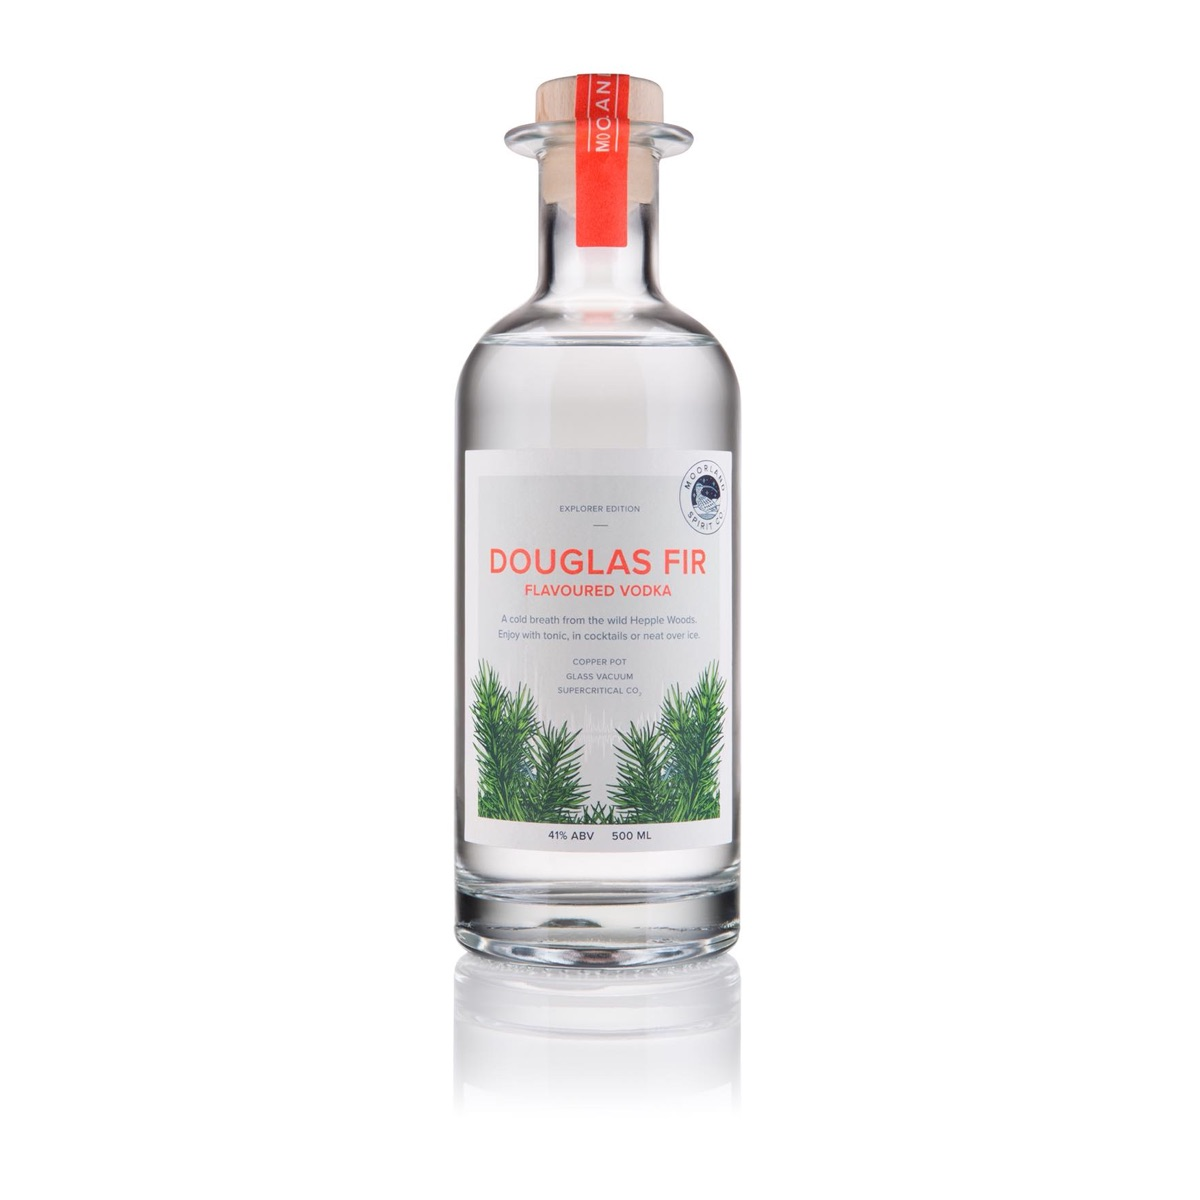 Douglas fir-flavoured vodka set to launch